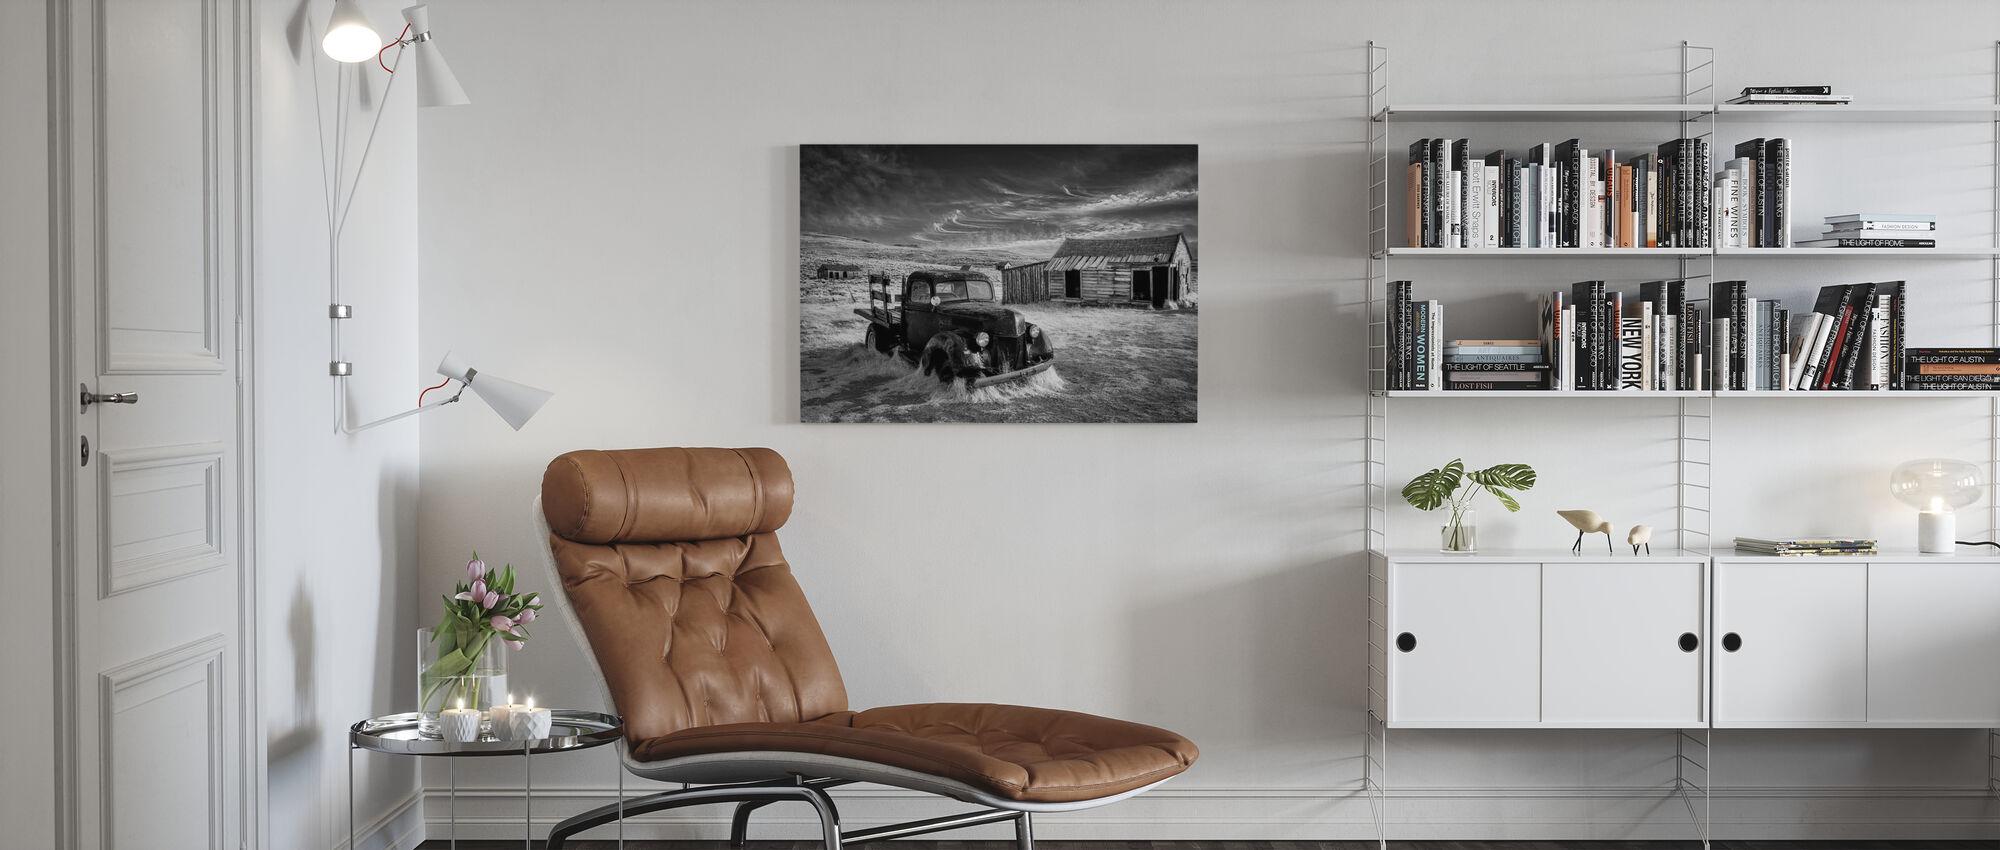 No More Gold - Canvas print - Living Room